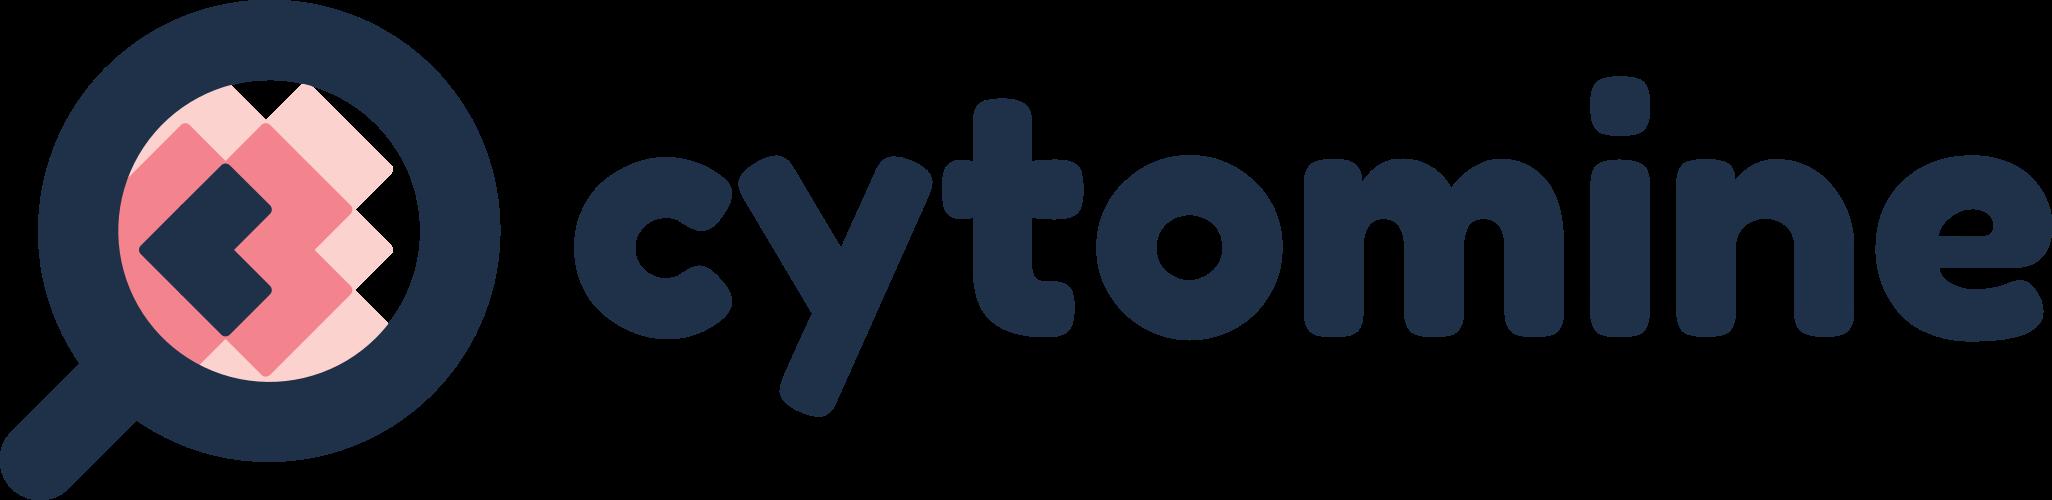 Cytomine Corporation